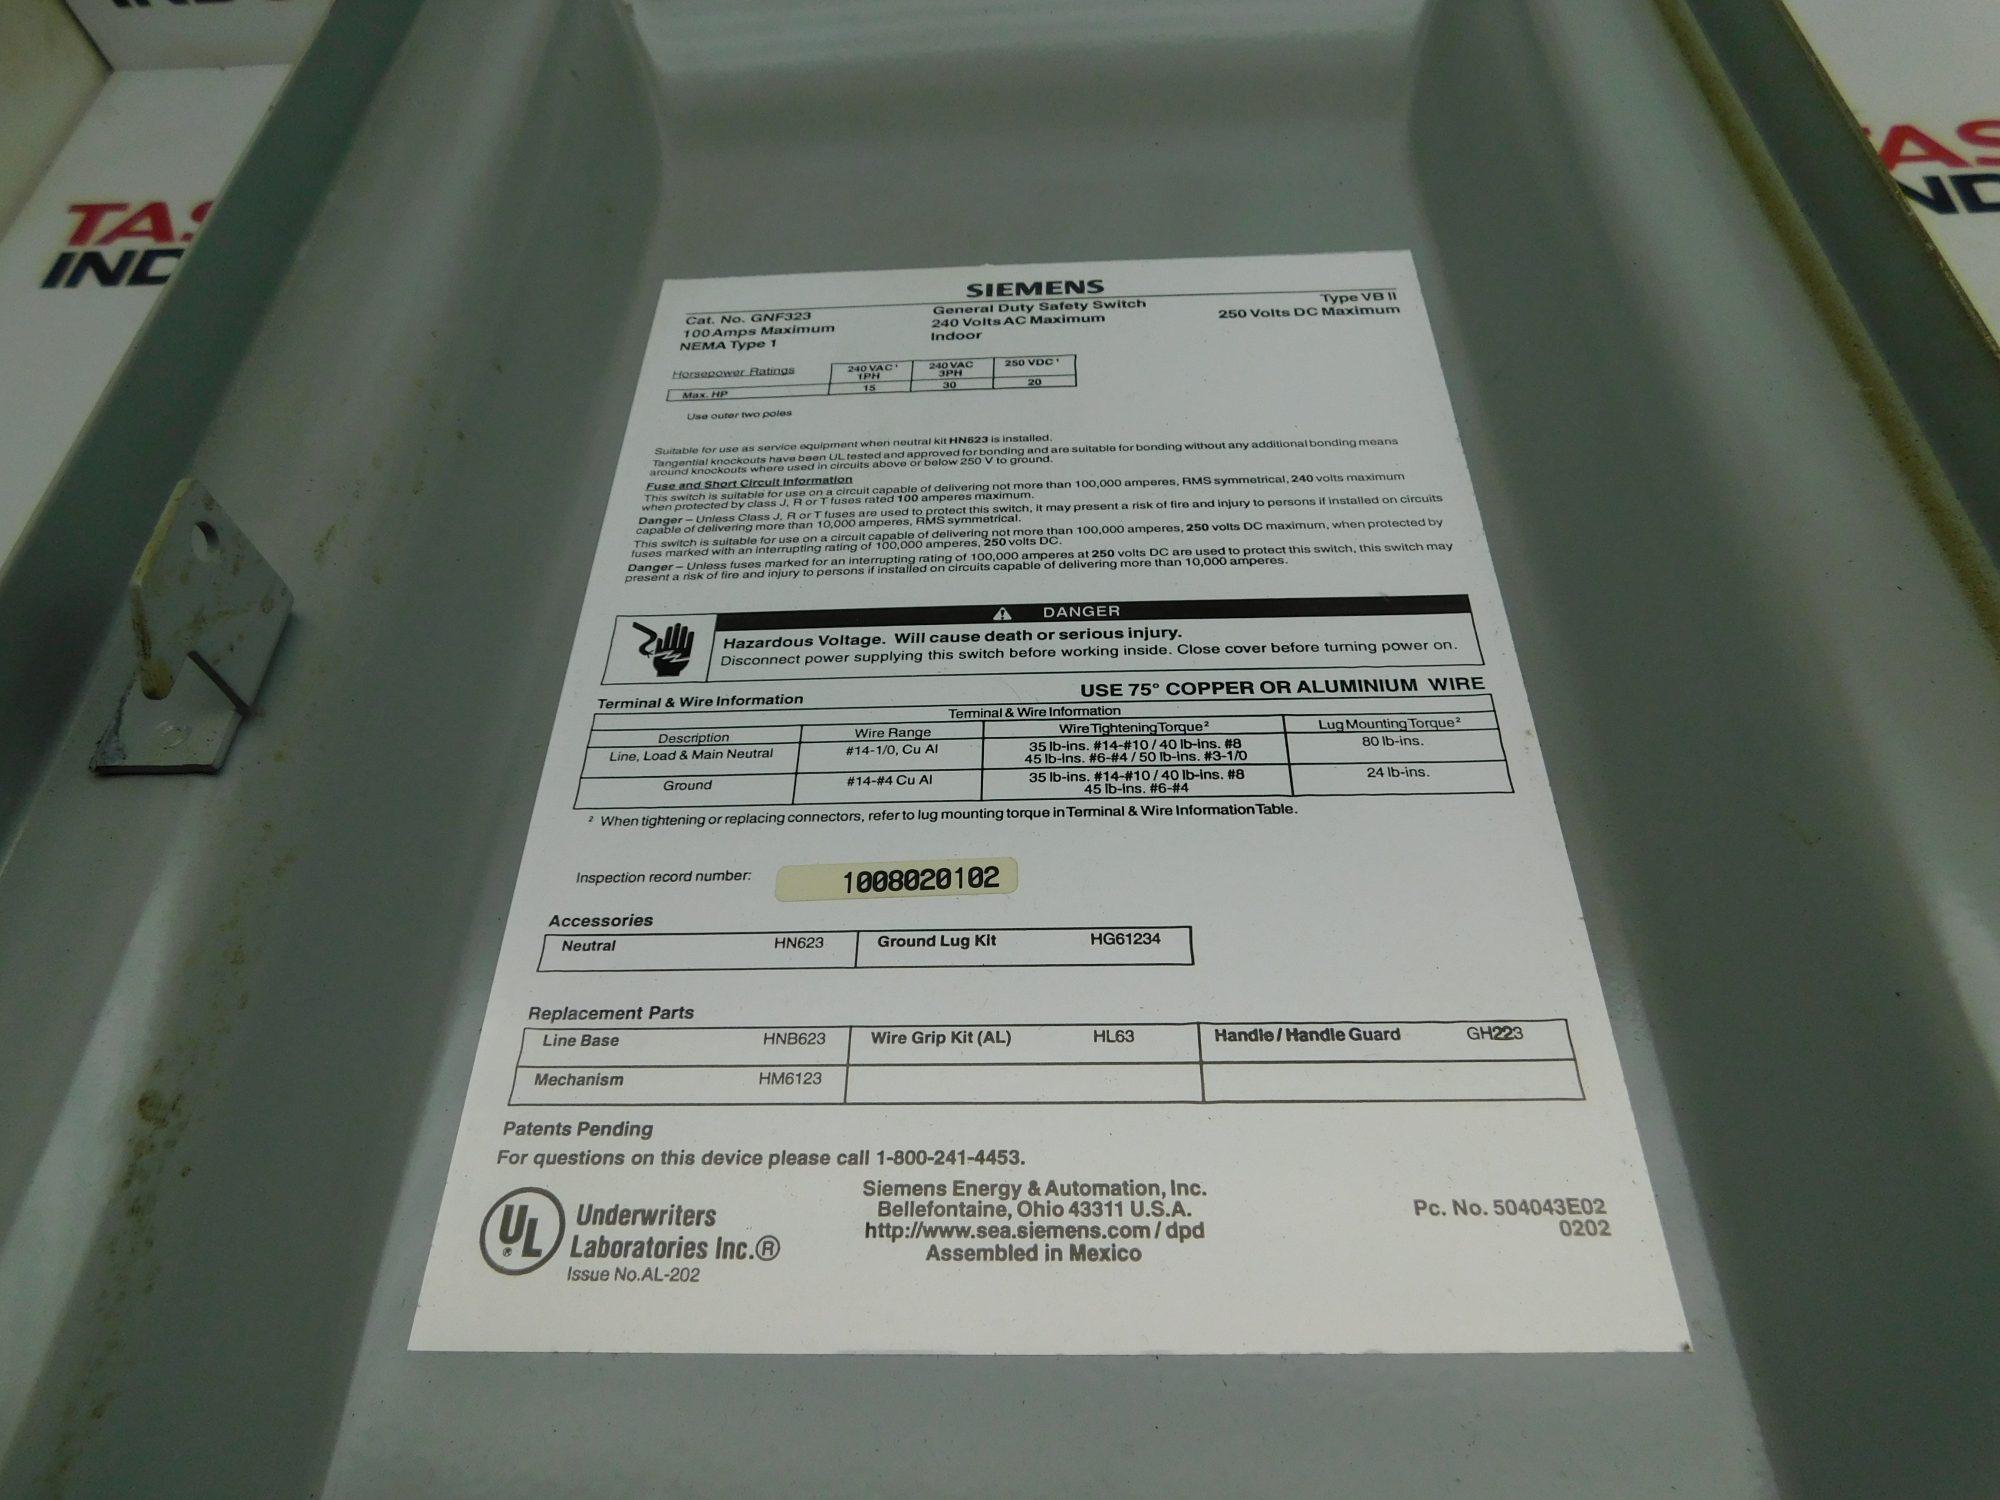 Siemens CAT No. GNF323, 240VAC 100A General Duty Safety Switch